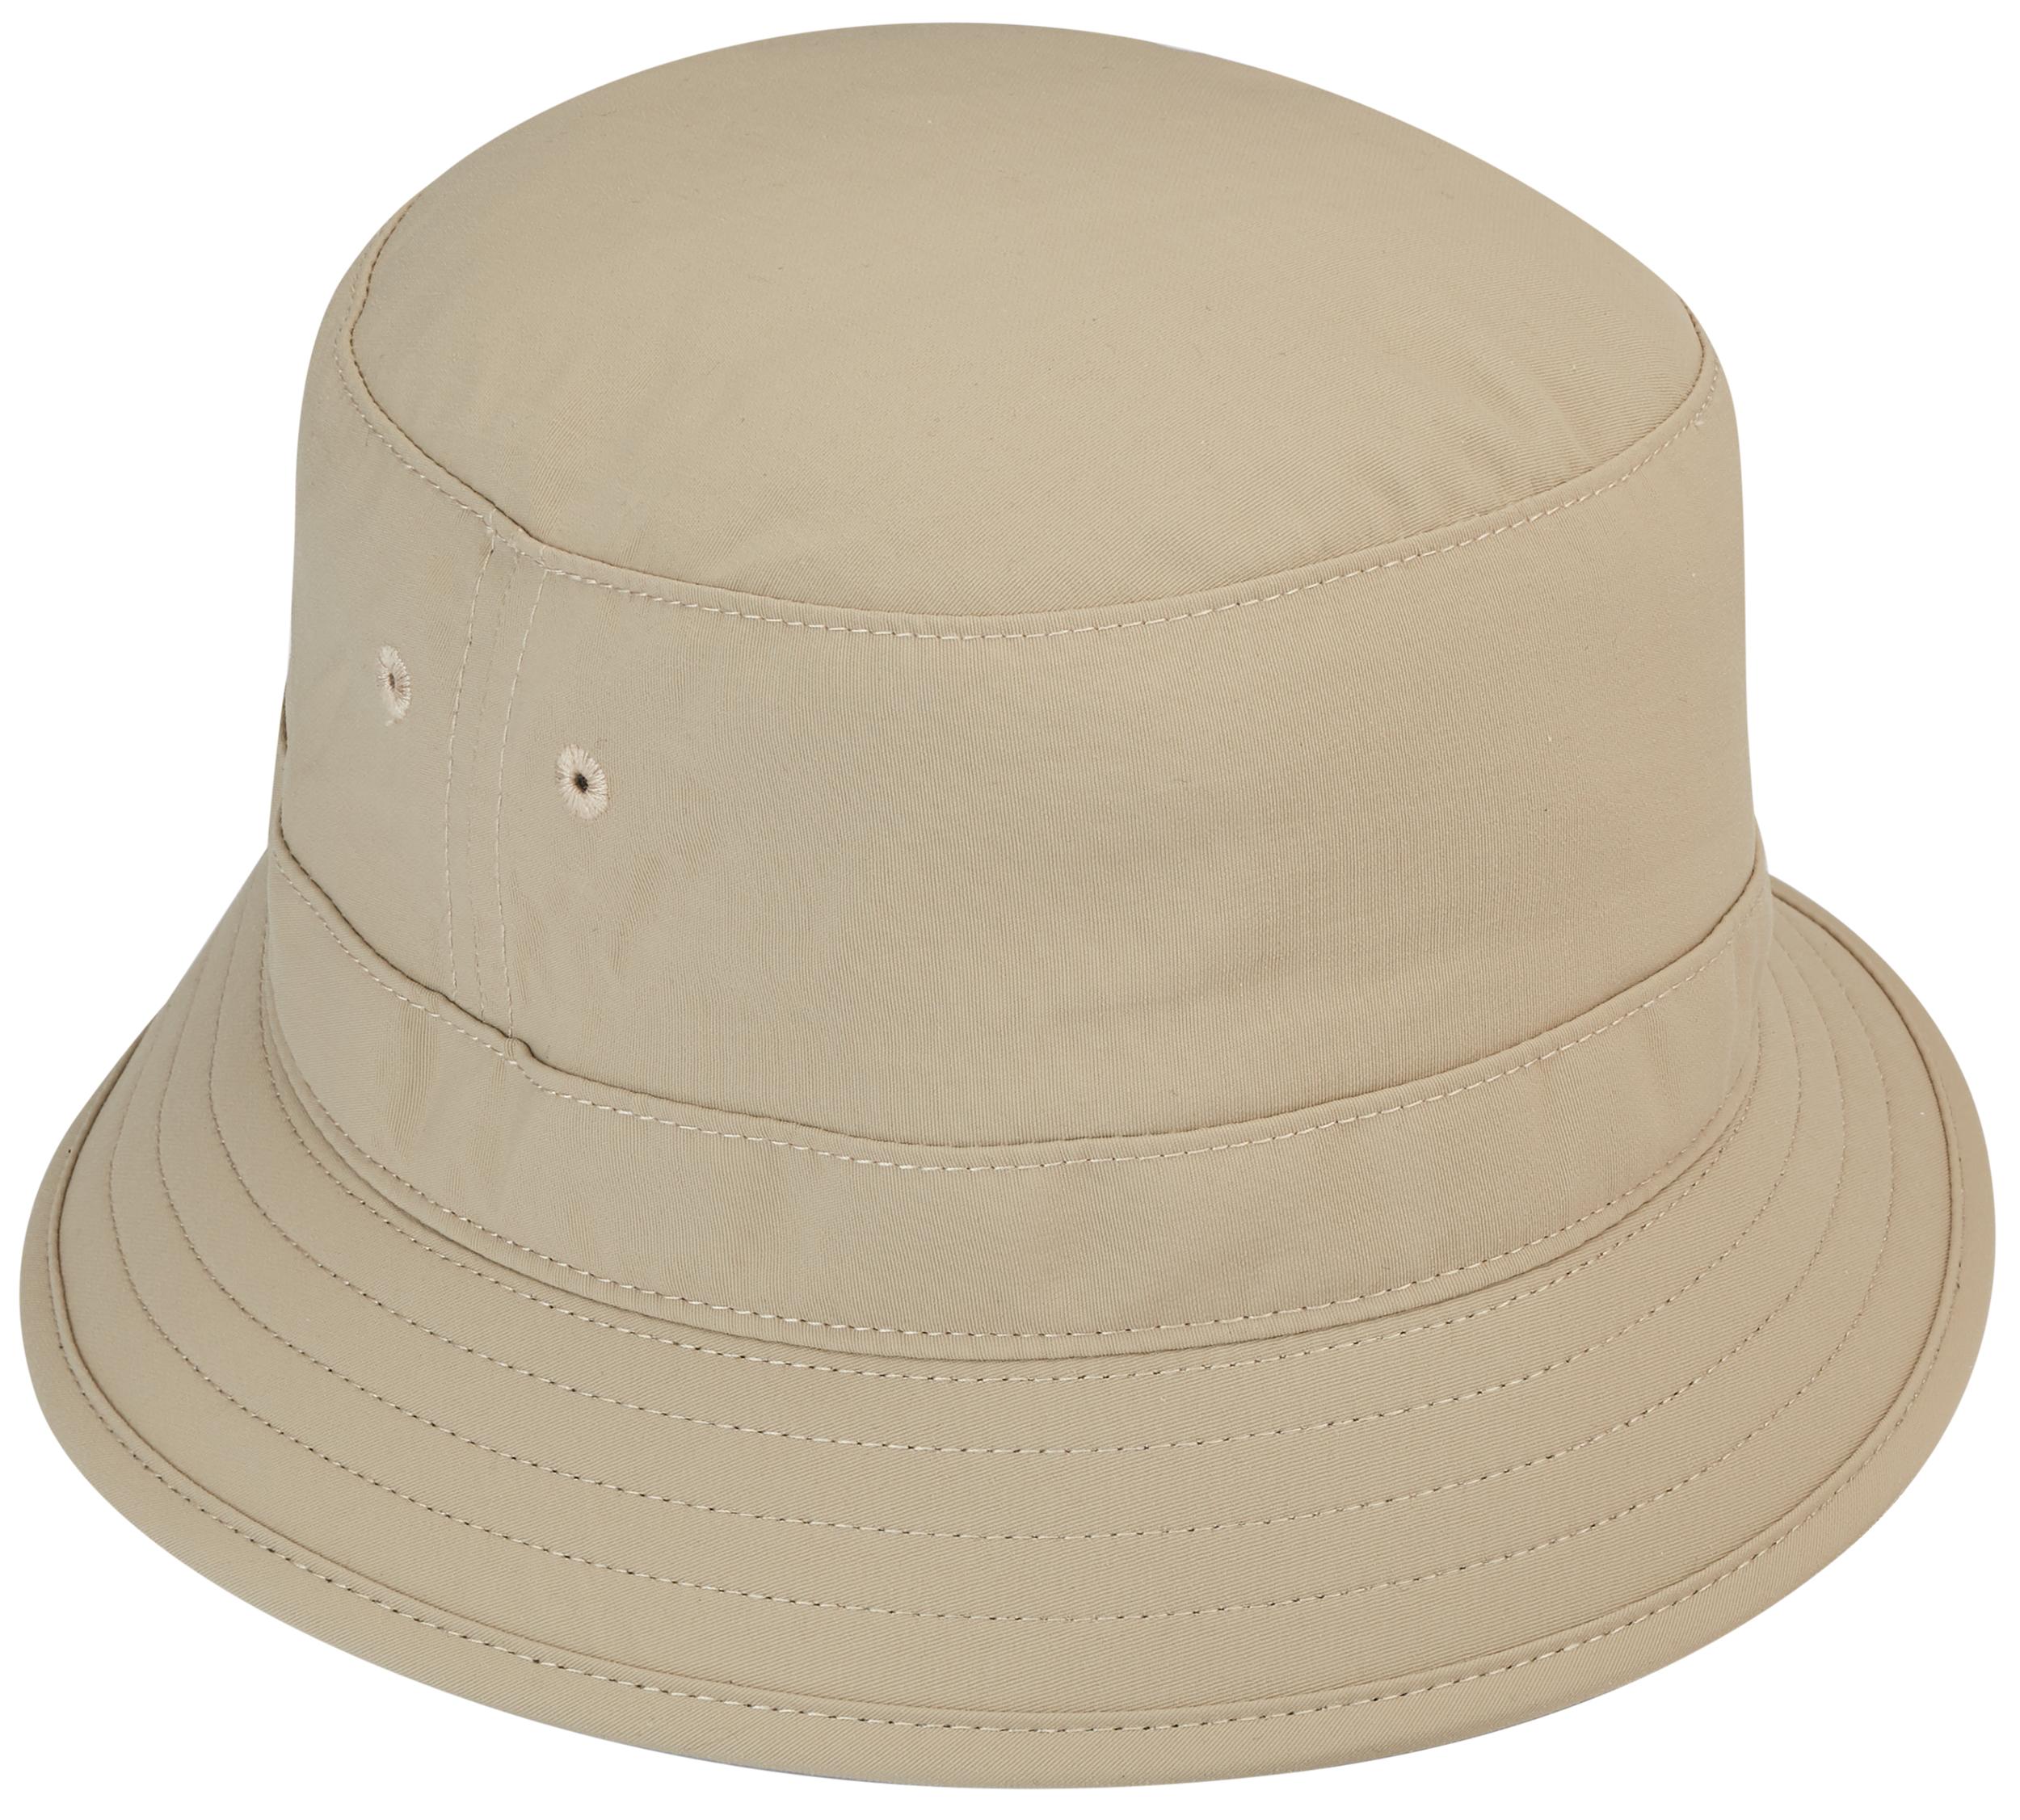 cfd7e7326 Sun hats | MEC